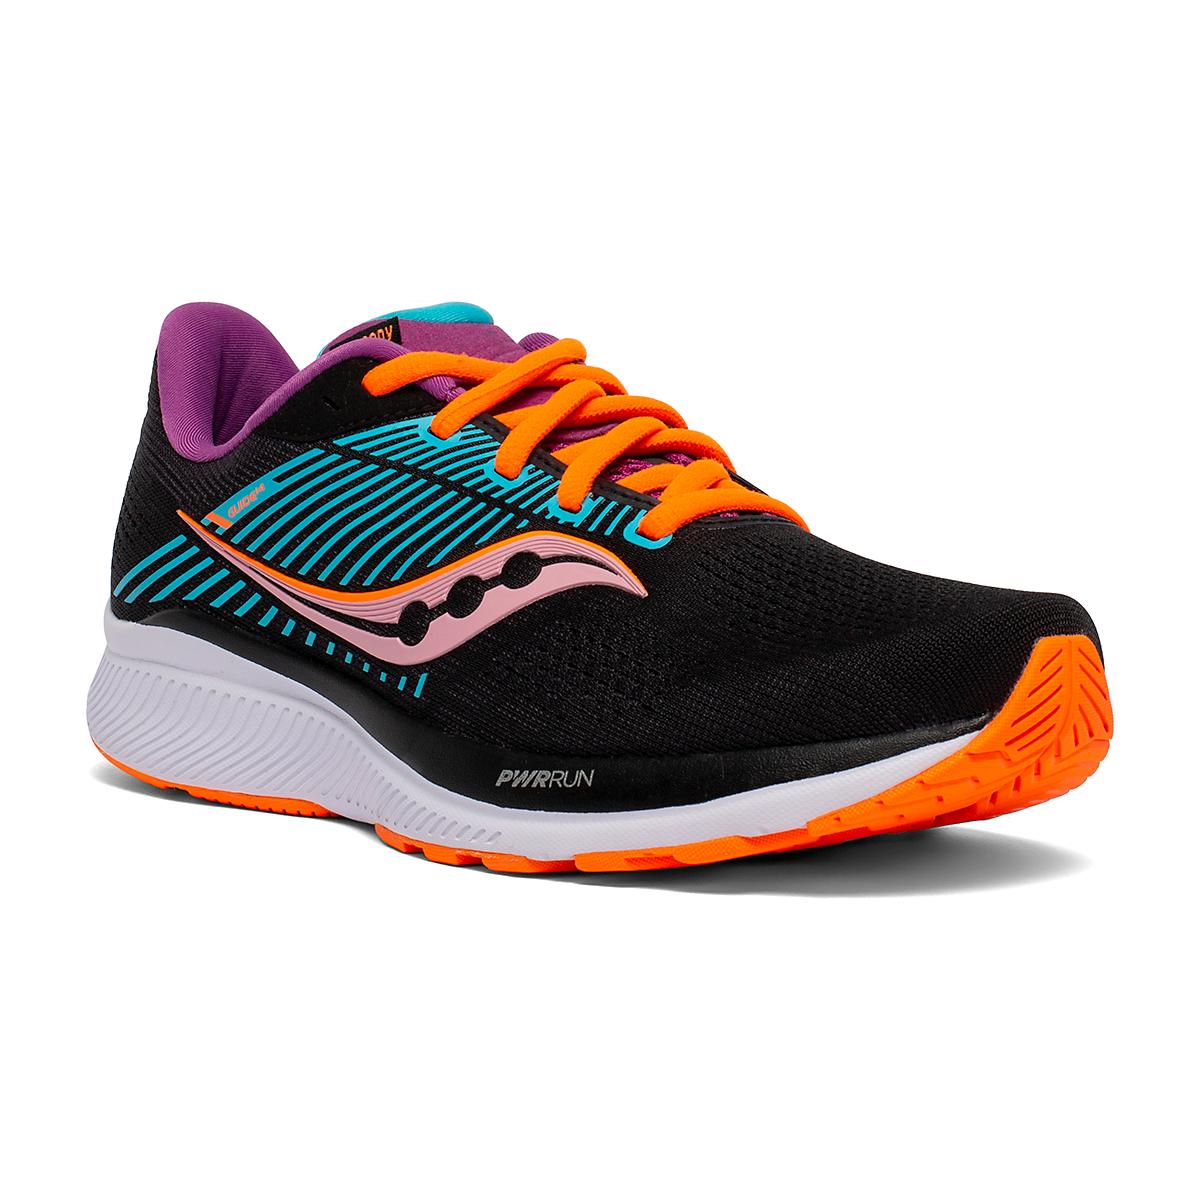 Women's Saucony Guide 14 Running Shoe - Color: Future/Black - Size: 5 - Width: Regular, Future/Black, large, image 3